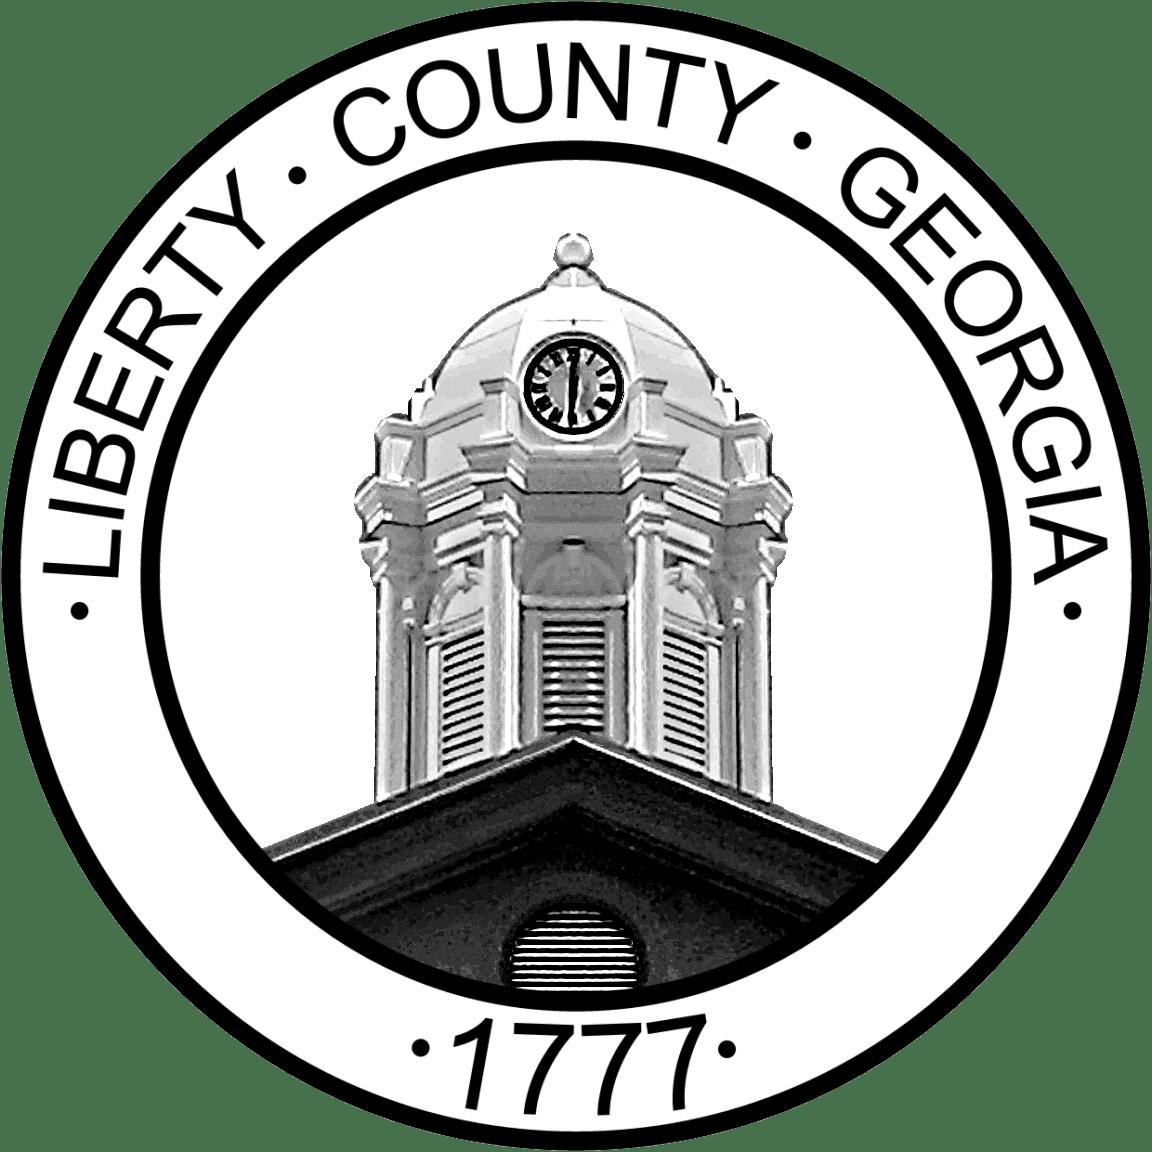 Liberty County Seal